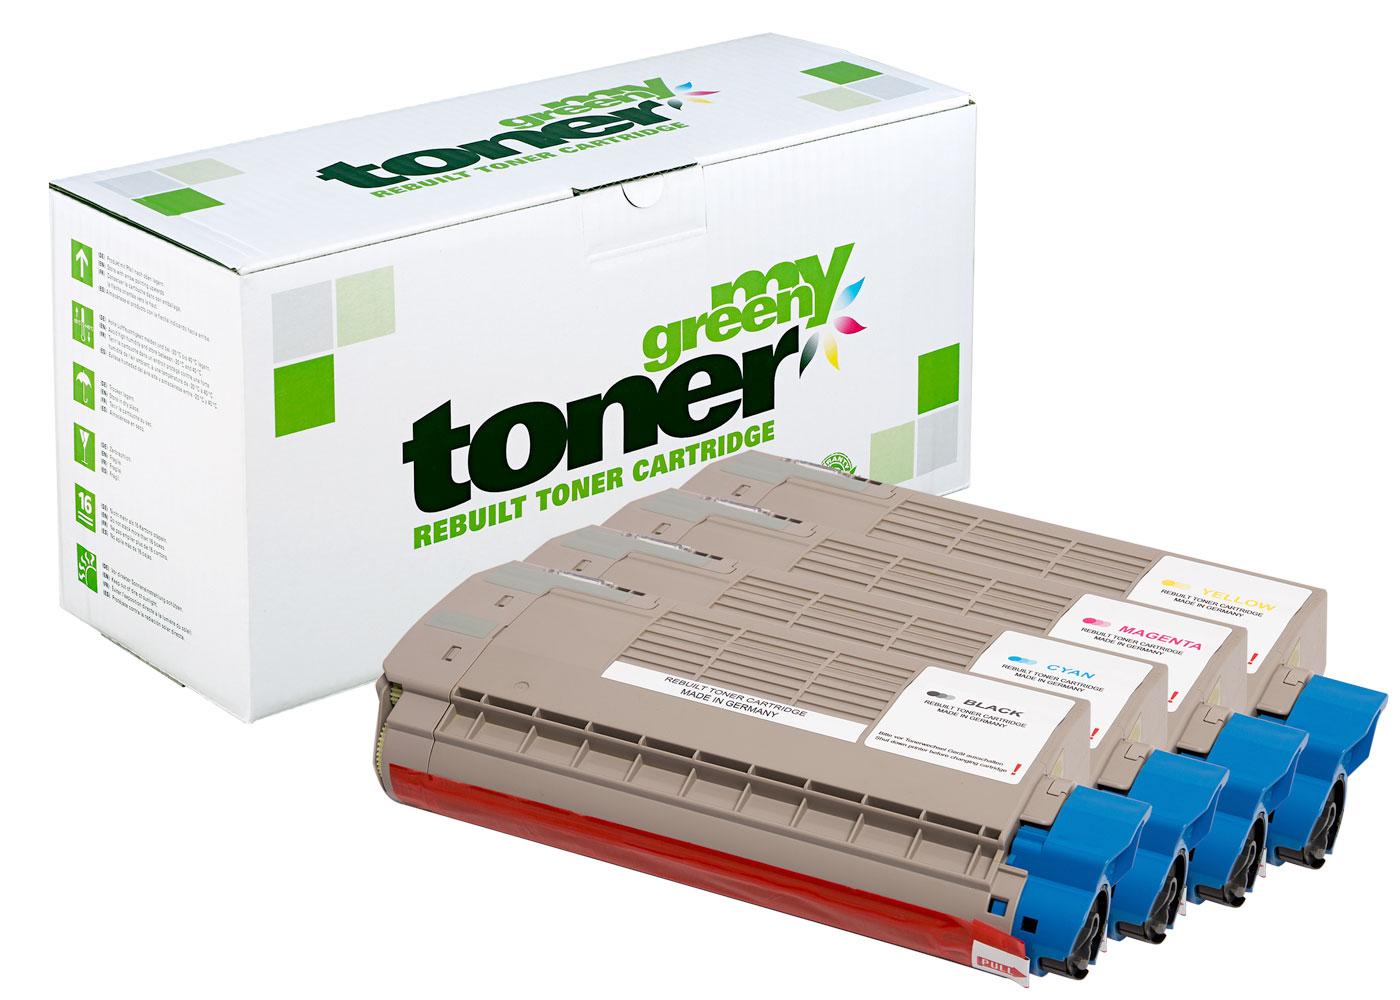 Rebuilt toner cartridge for Oki ES 7412